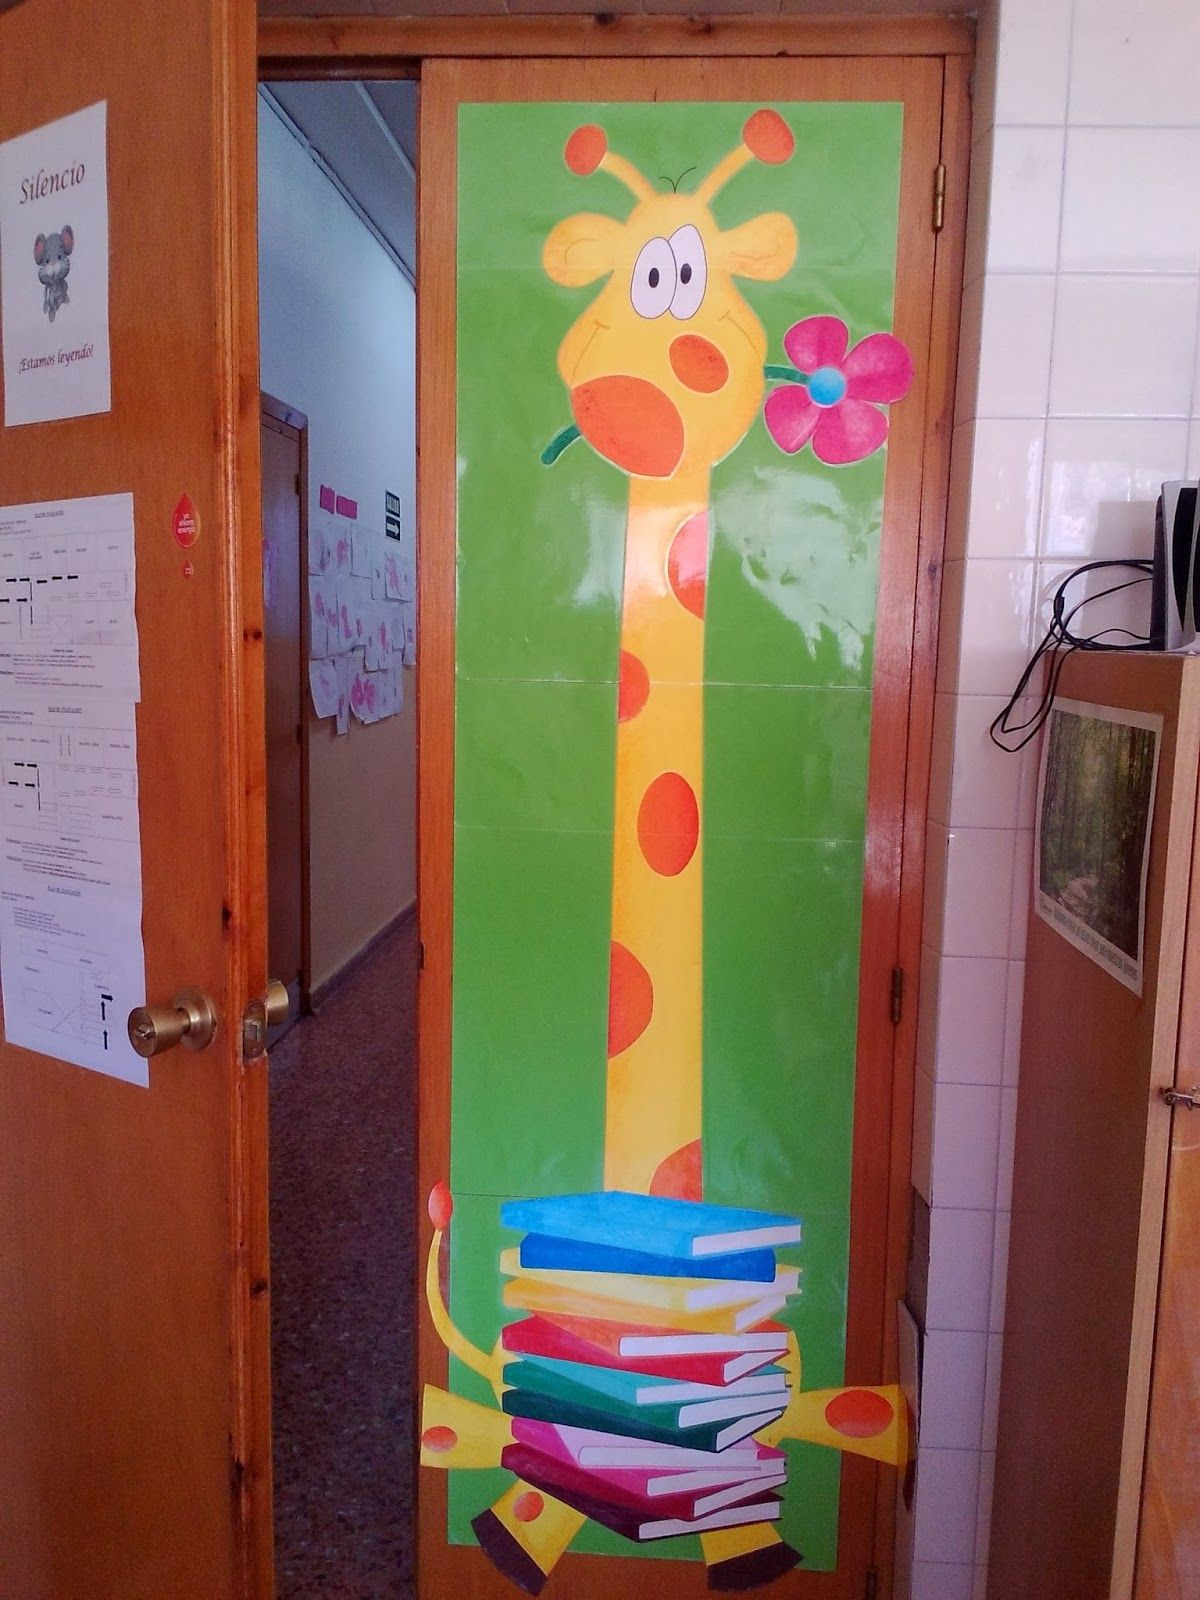 Mascota biblioteca | Carteleras y puertas | Pinterest | Bibliotecas ...